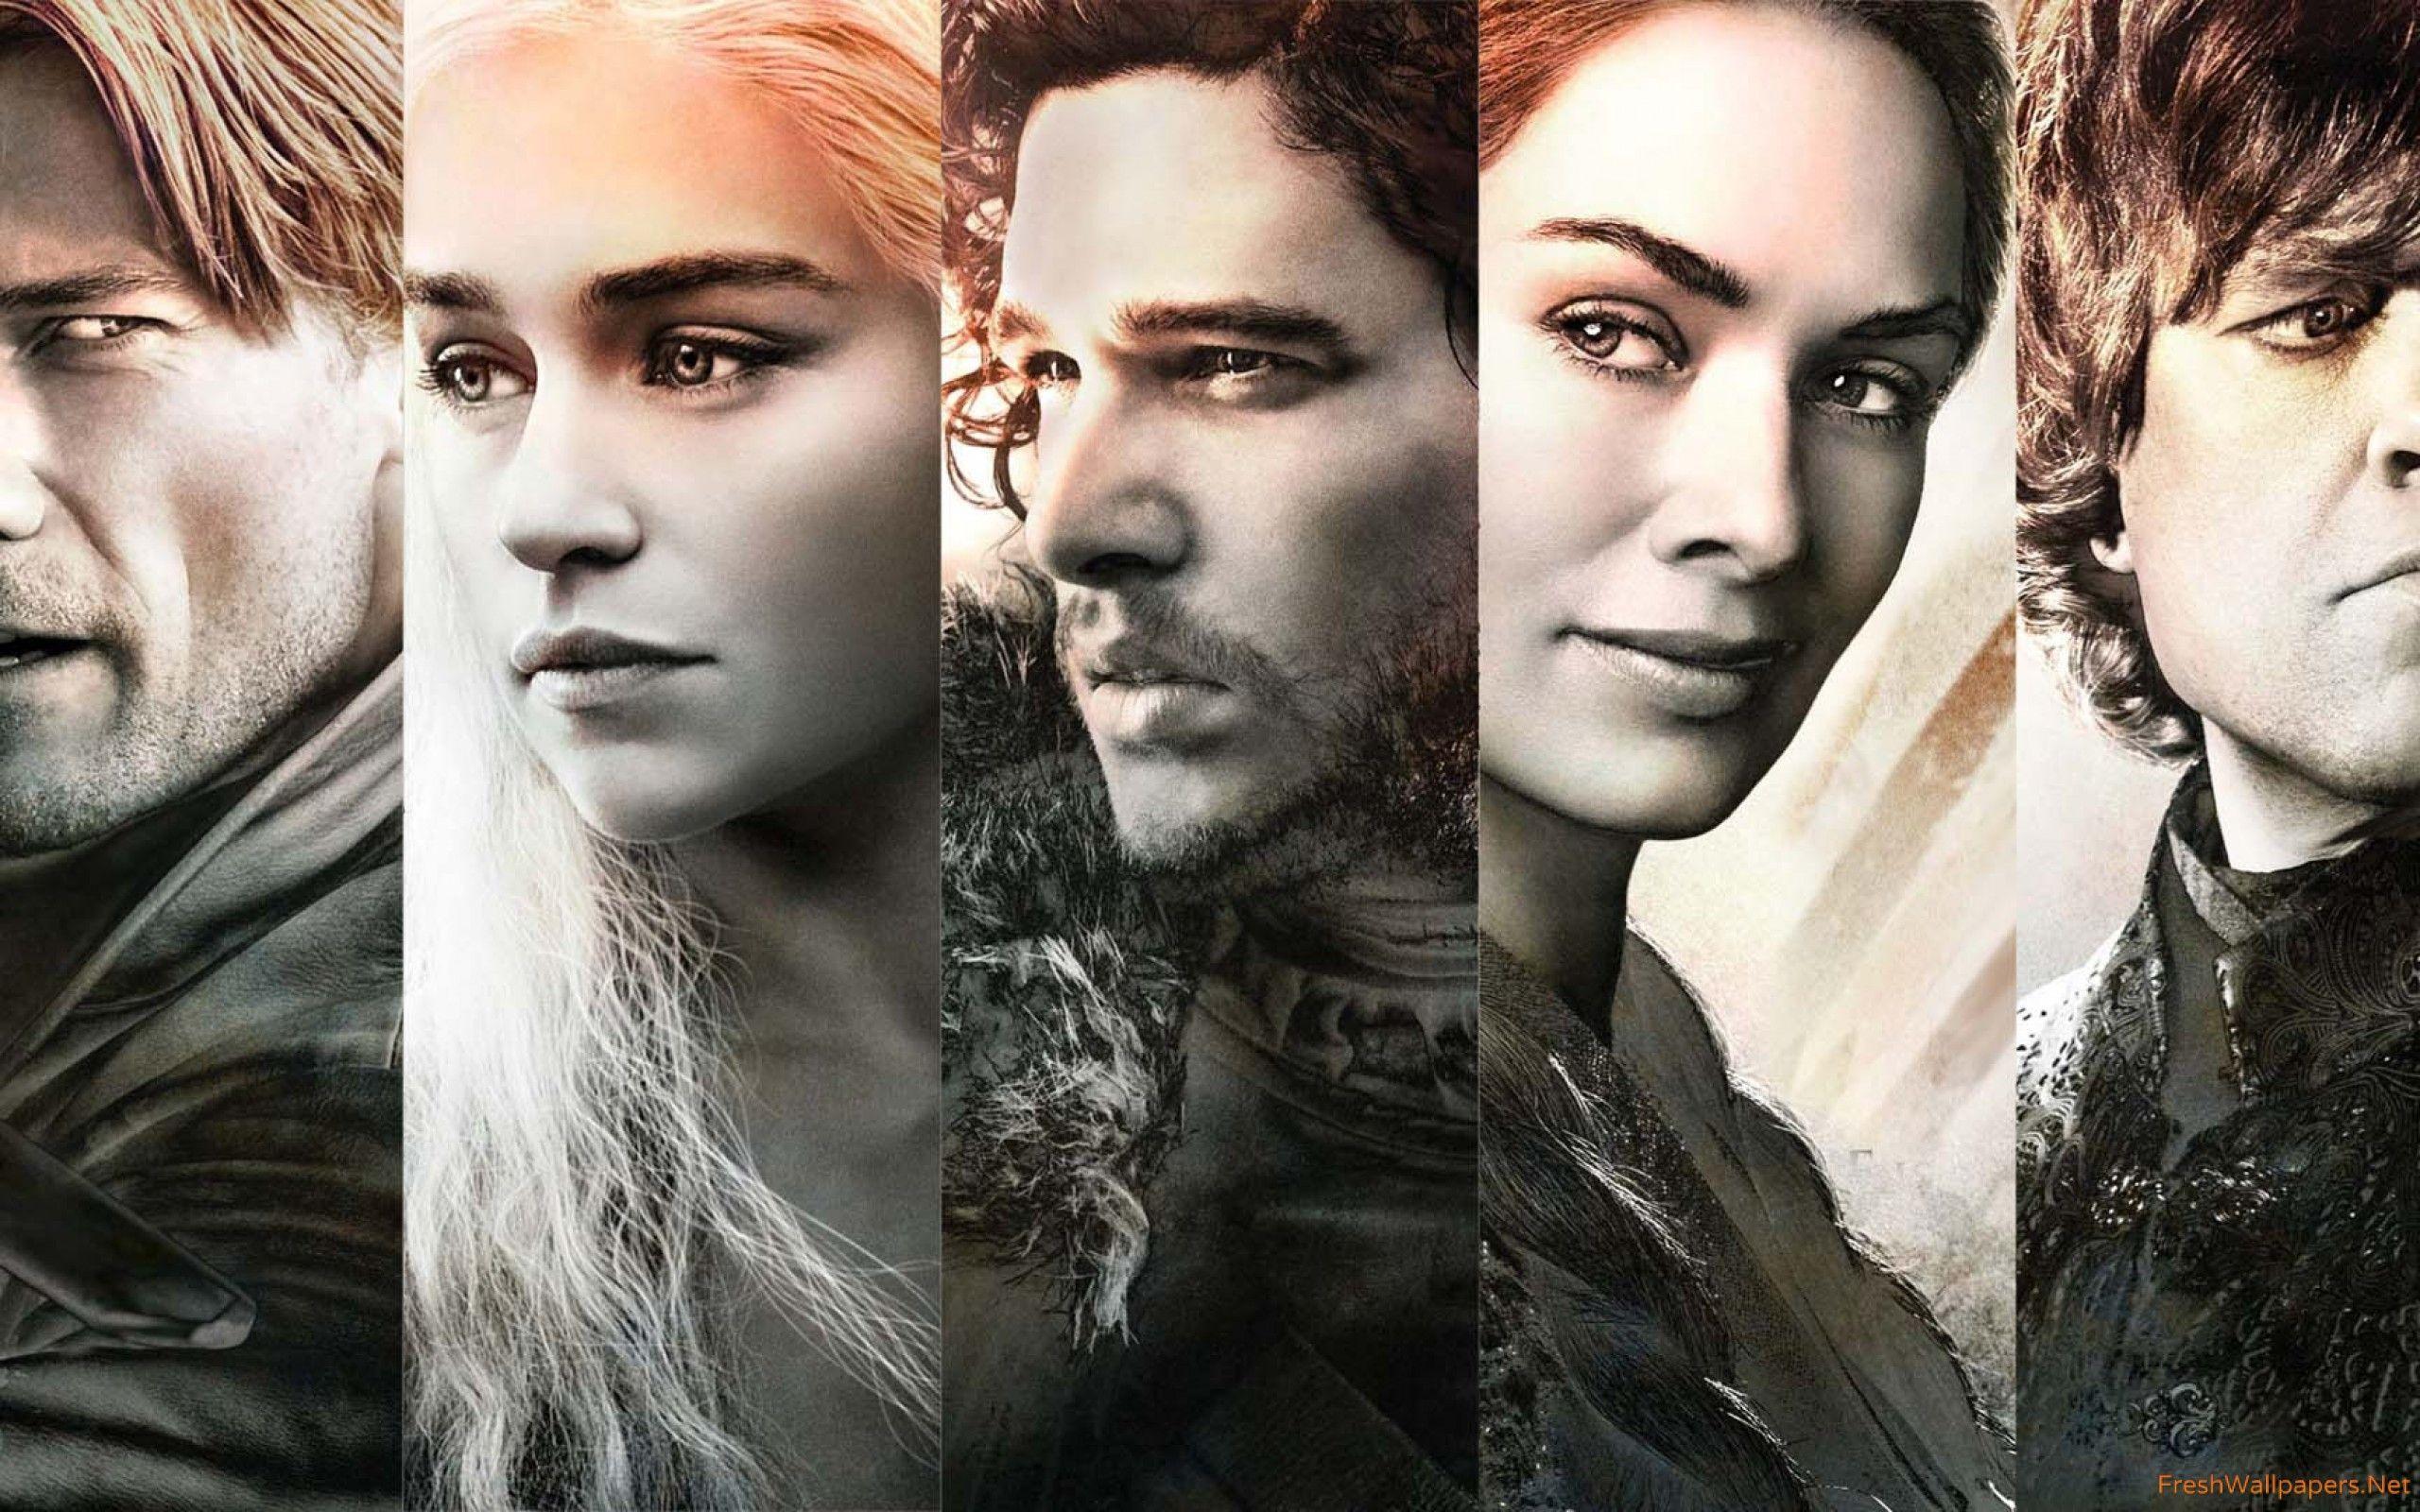 Game Of Thrones Season 5 Main Characters Wallpapers - Game Of Thrones Wallpaper Characters - HD Wallpaper